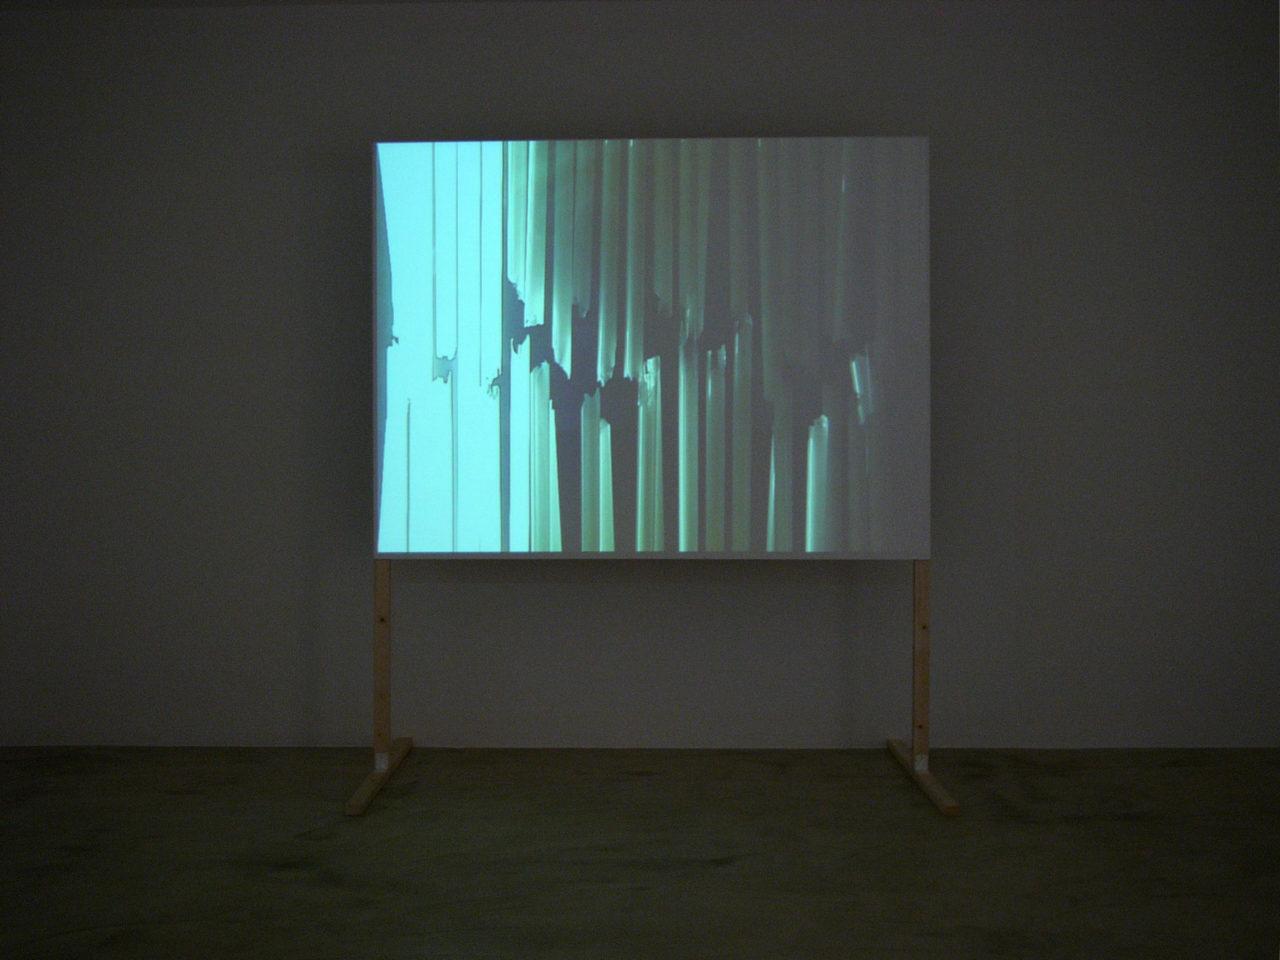 Matt Calderwood, Stripes (Vertical) (2005)